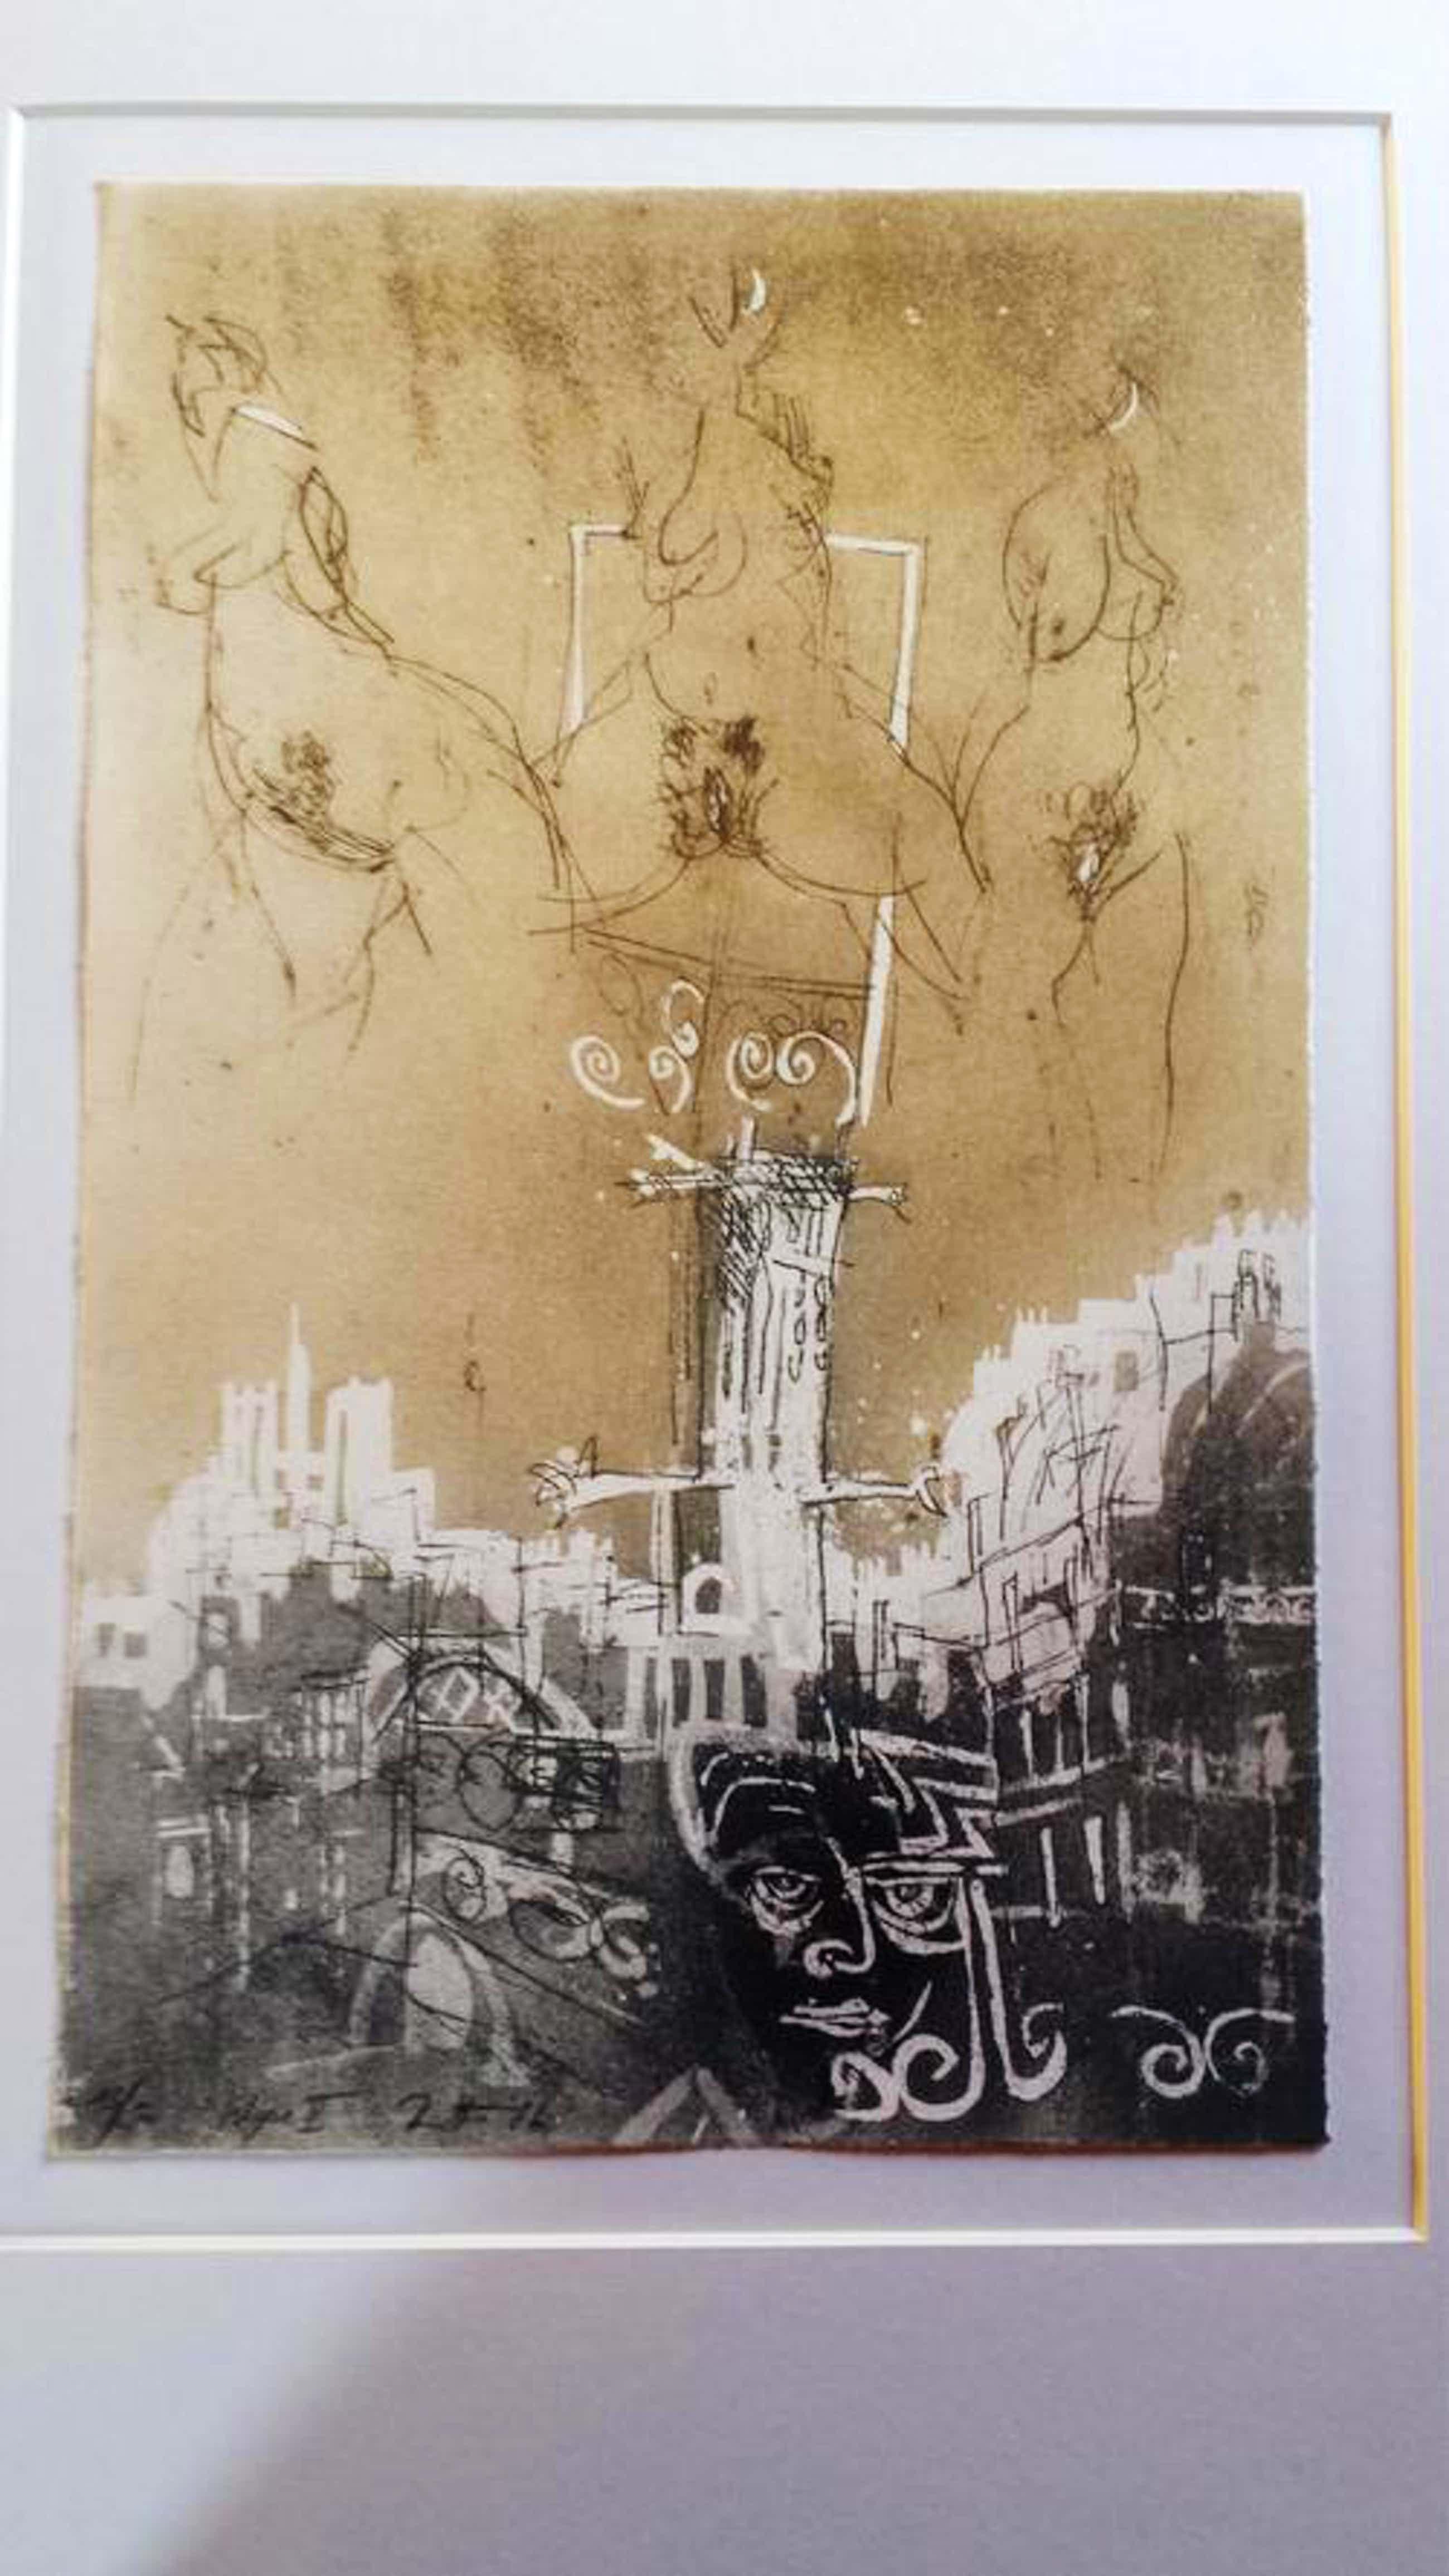 Karl Brandstatter - Wege II, Lithographie kopen? Bied vanaf 150!